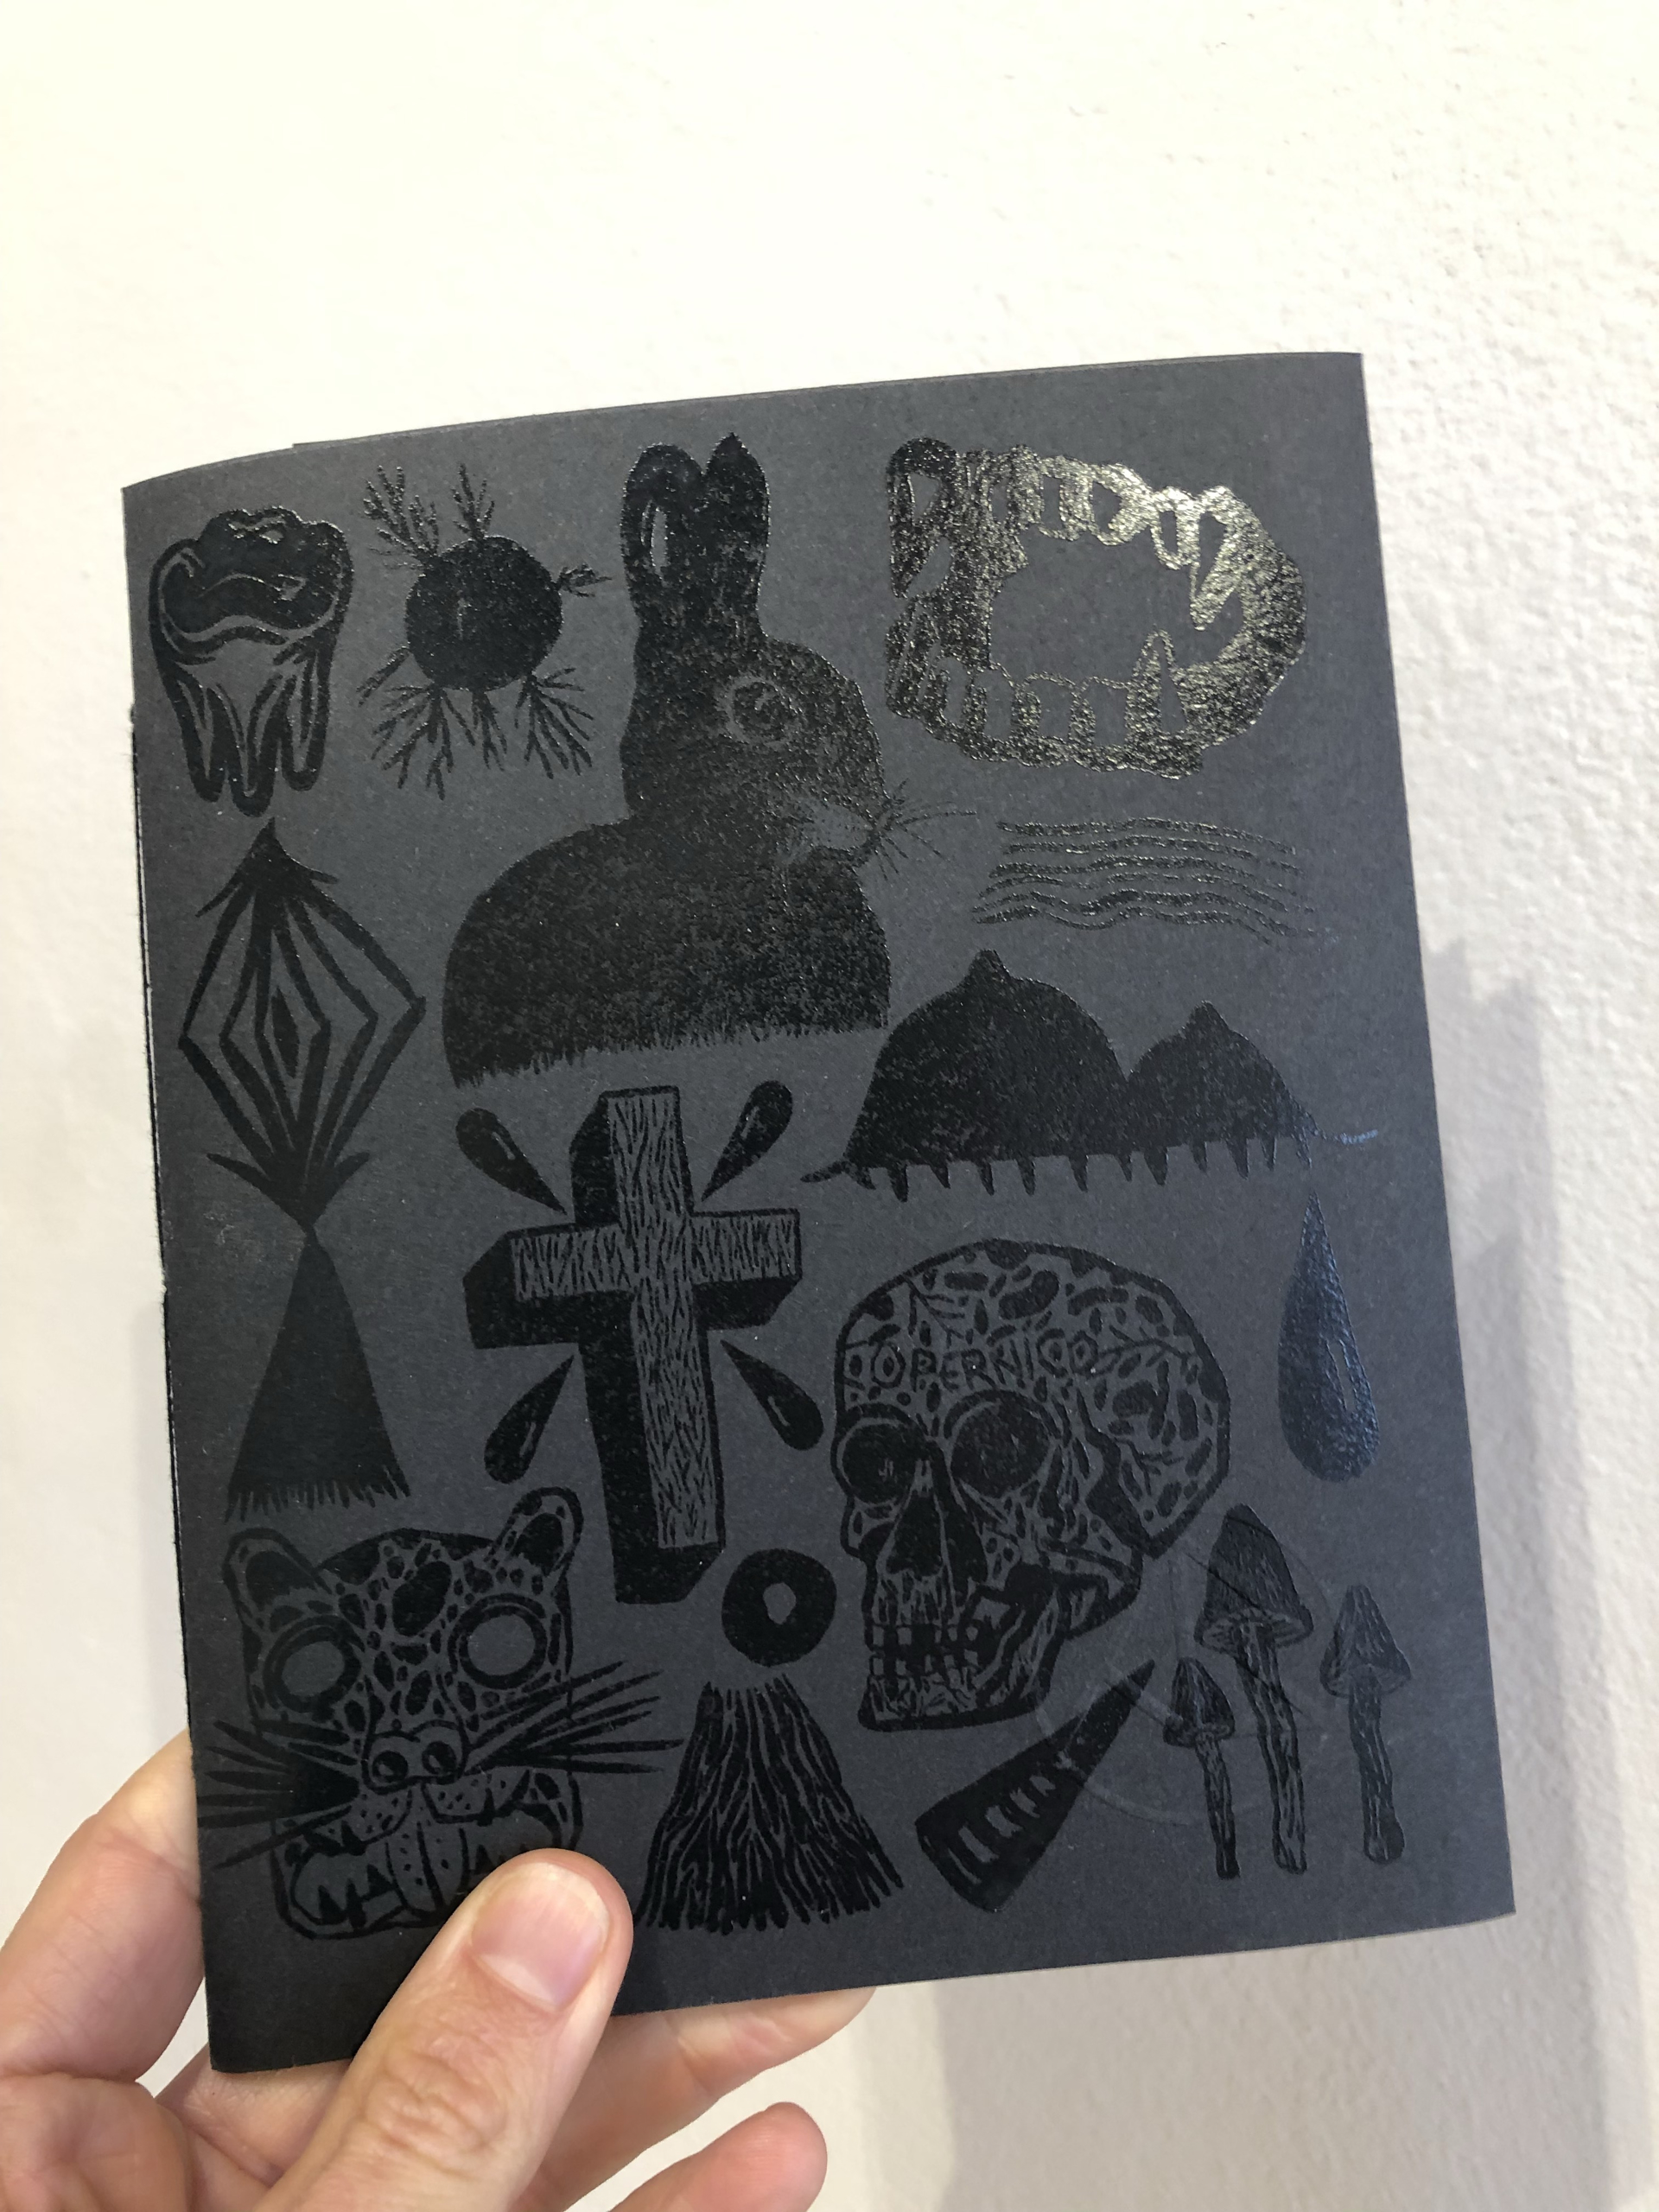 Copernico Libro by Polvoh Press